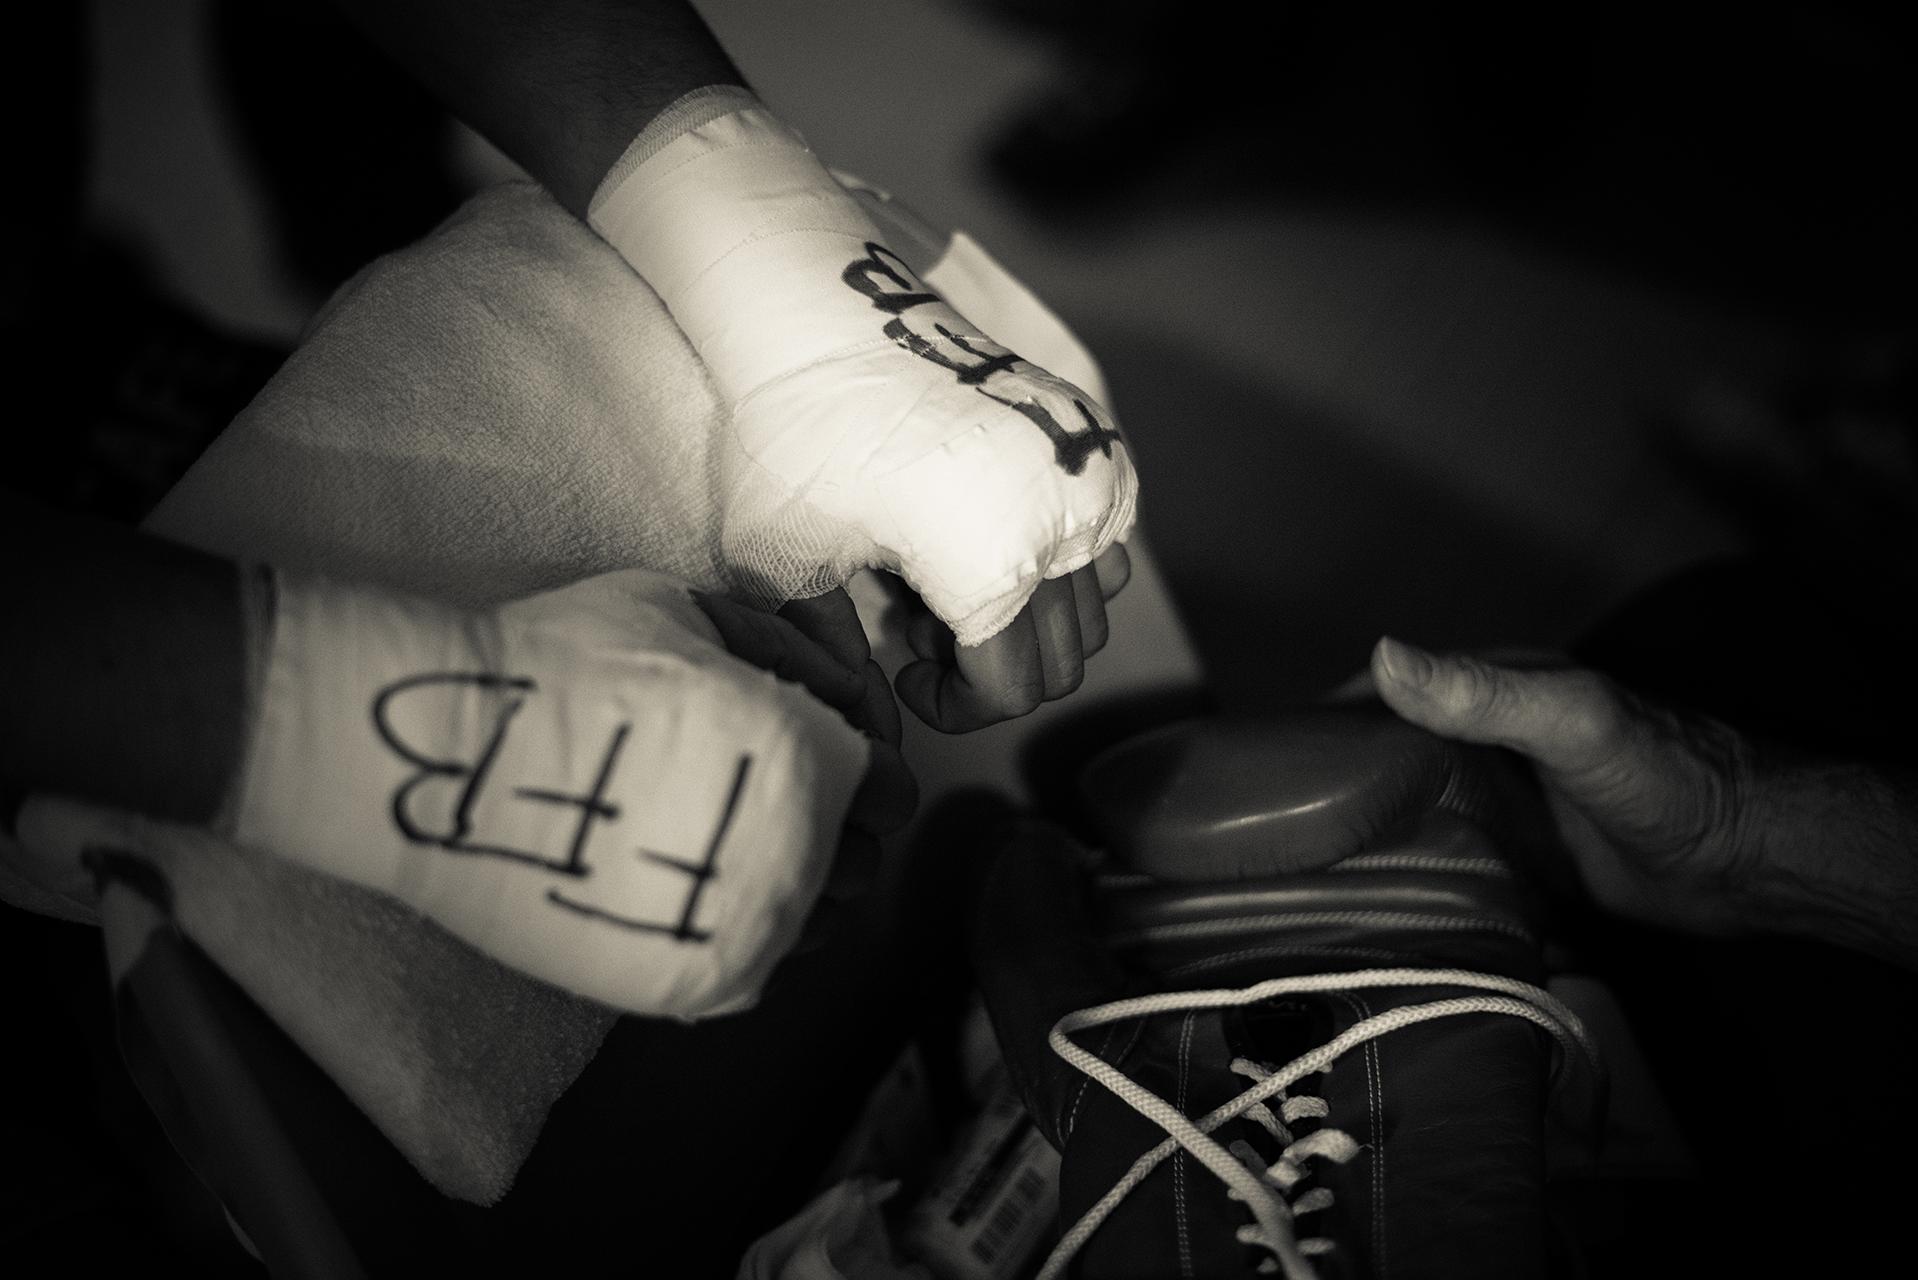 photographe-ile-de-france-reportage-boxe-maya-angelsen